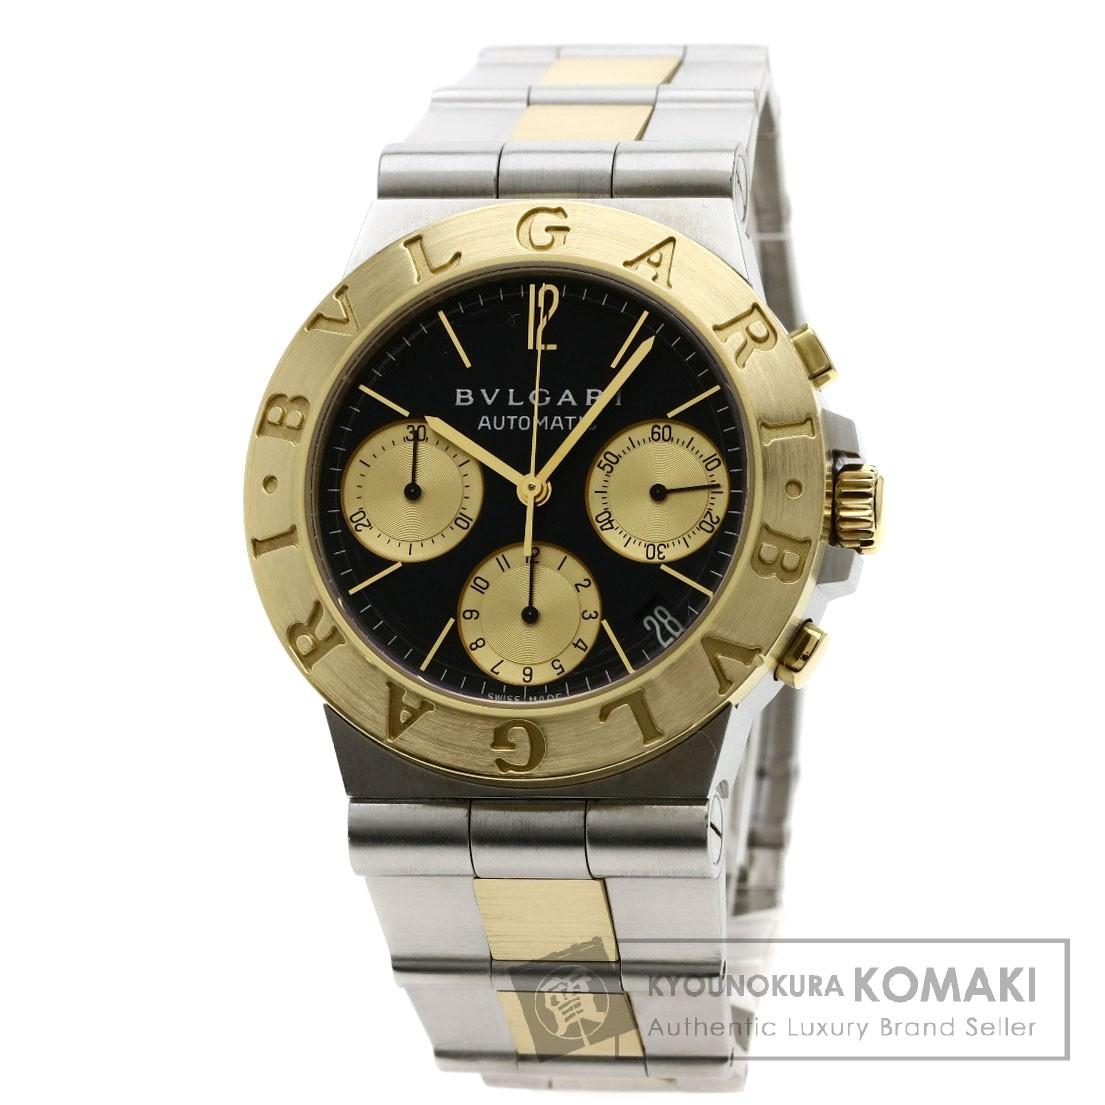 BVLGARI CH35SGD ディアゴノ クロノグラフ 腕時計 OH済 ステンレススチール/SSxK18YG/K18YG メンズ 【中古】【ブルガリ】